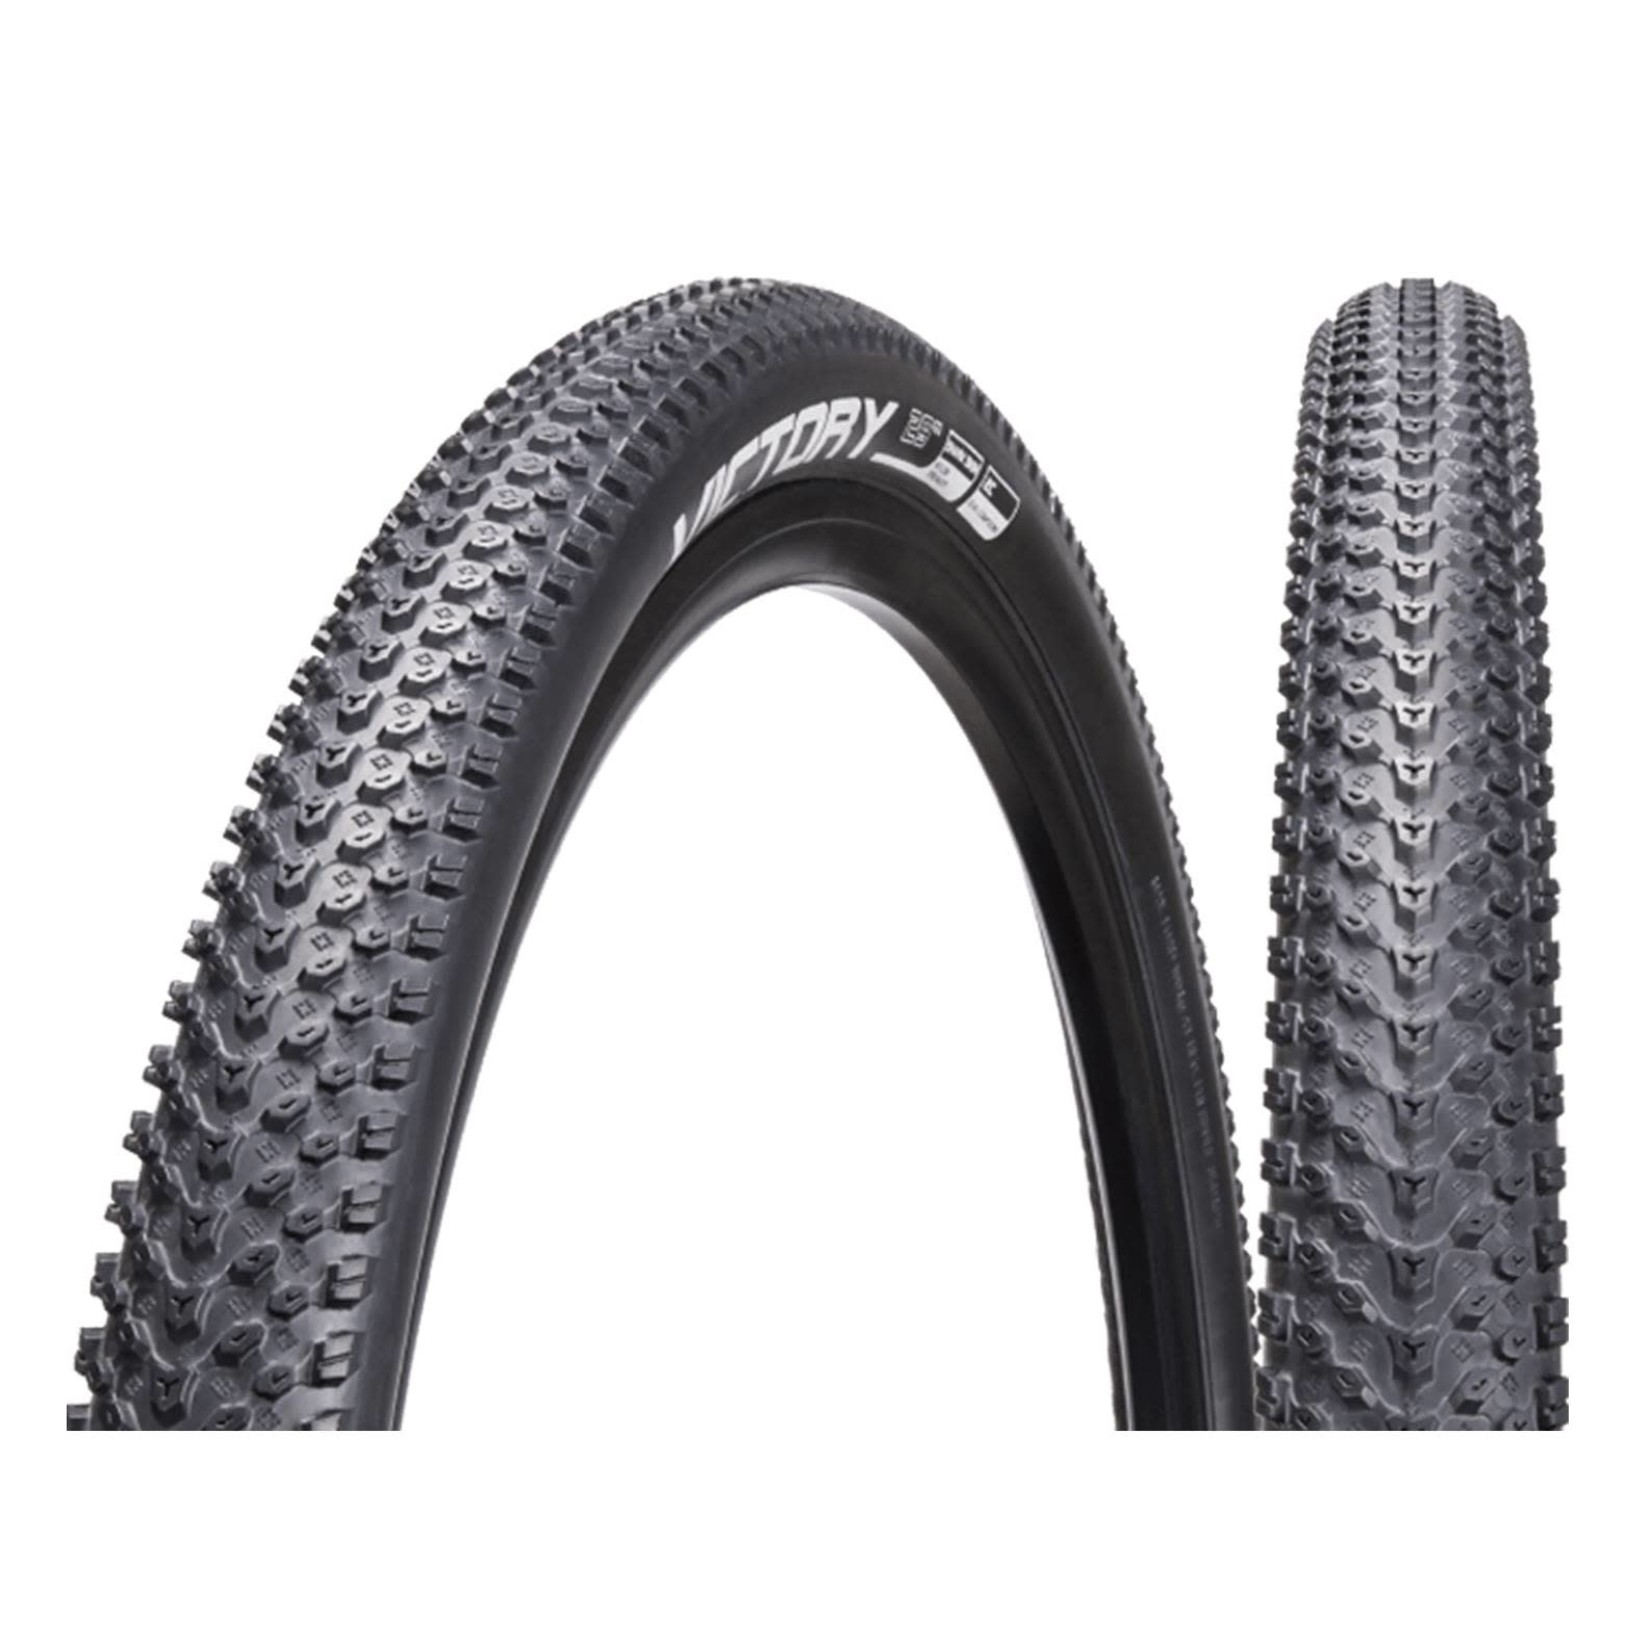 Chaoyang Victory 29 x 2.25 Kevlar Tyre